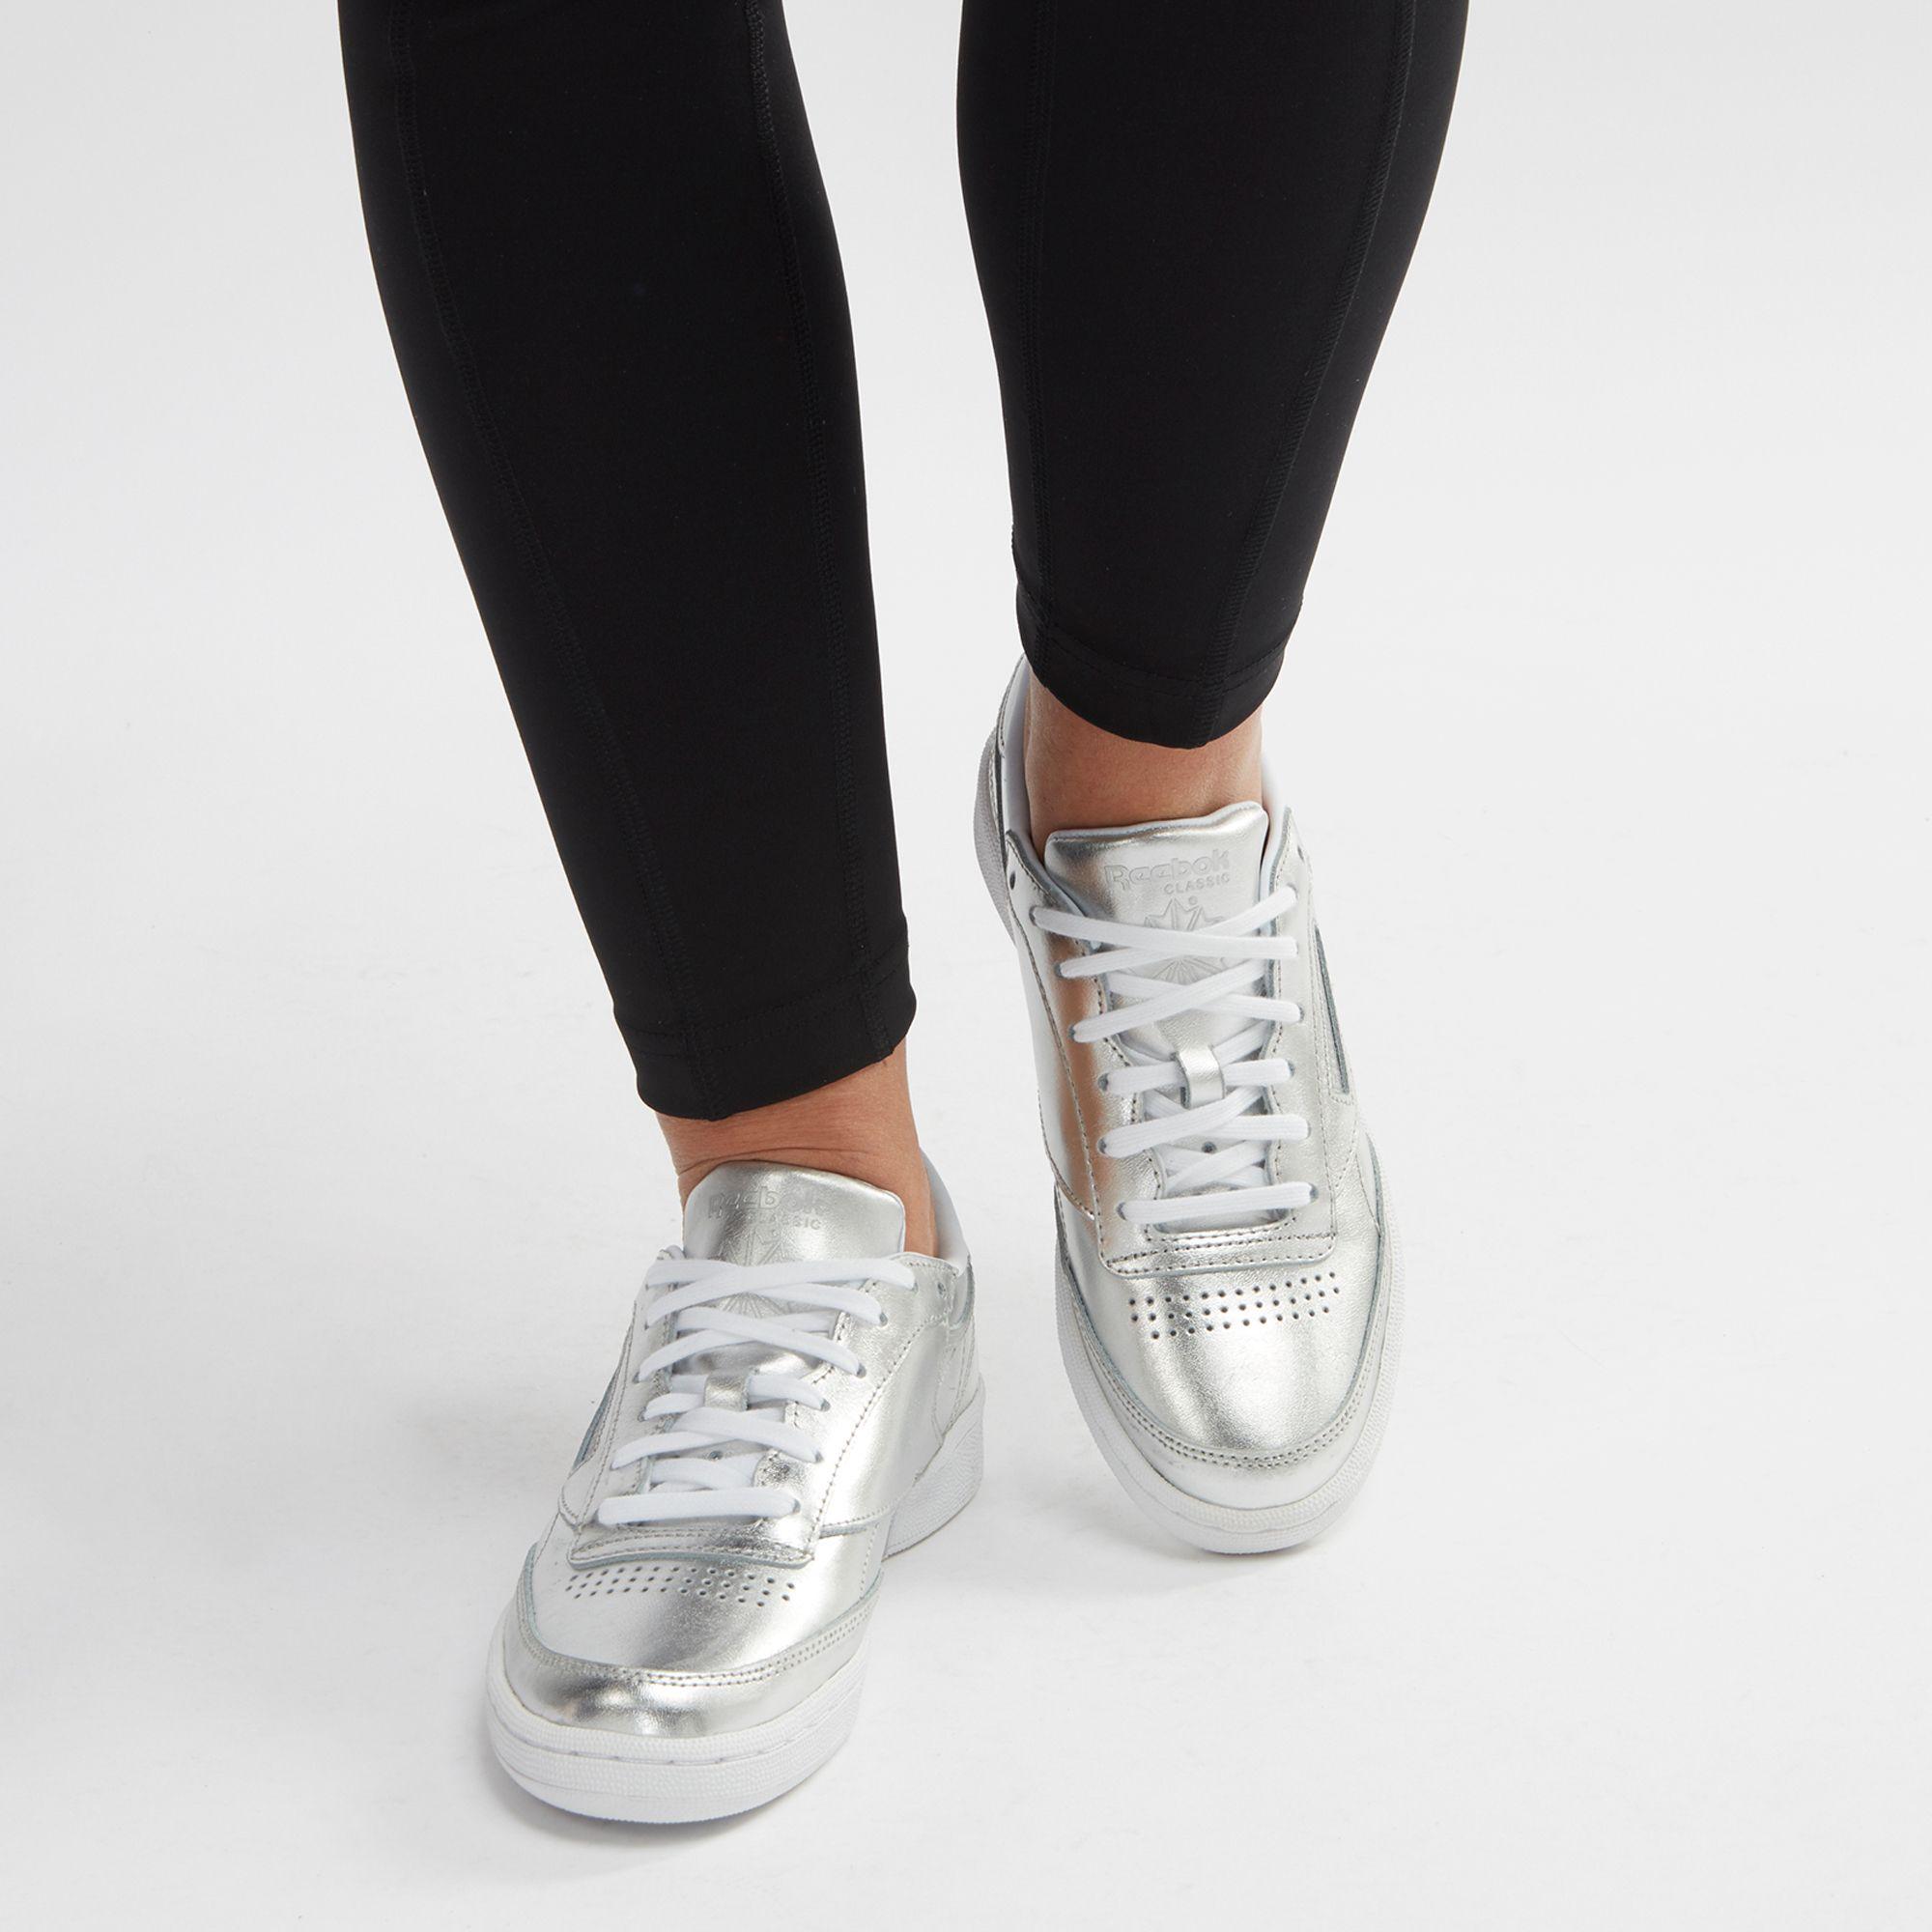 831a55dae7819 Shop Metallic Reebok Club C 85 S Shine Shoe for Womens by Reebok - 0 ...